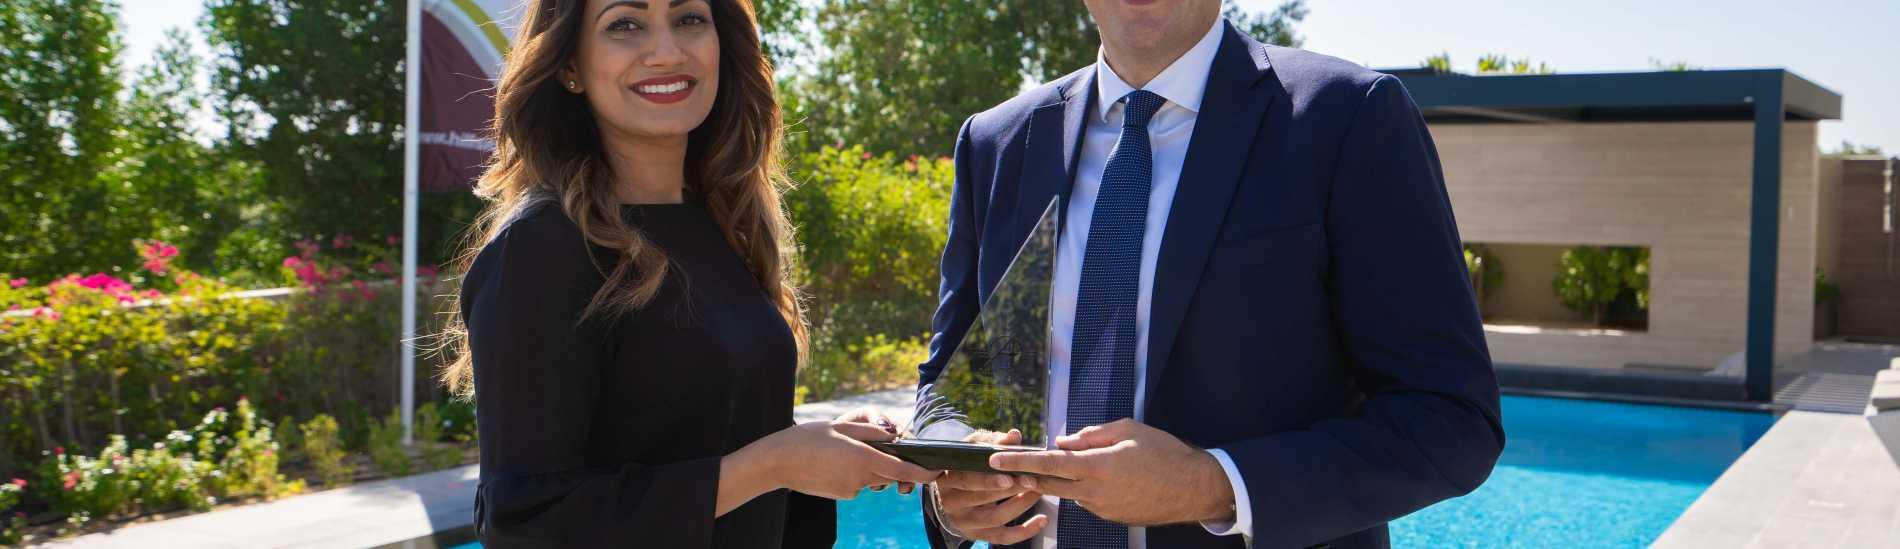 MENAFN - Dubai's Luxury Brokerage Ends Year on a High Note